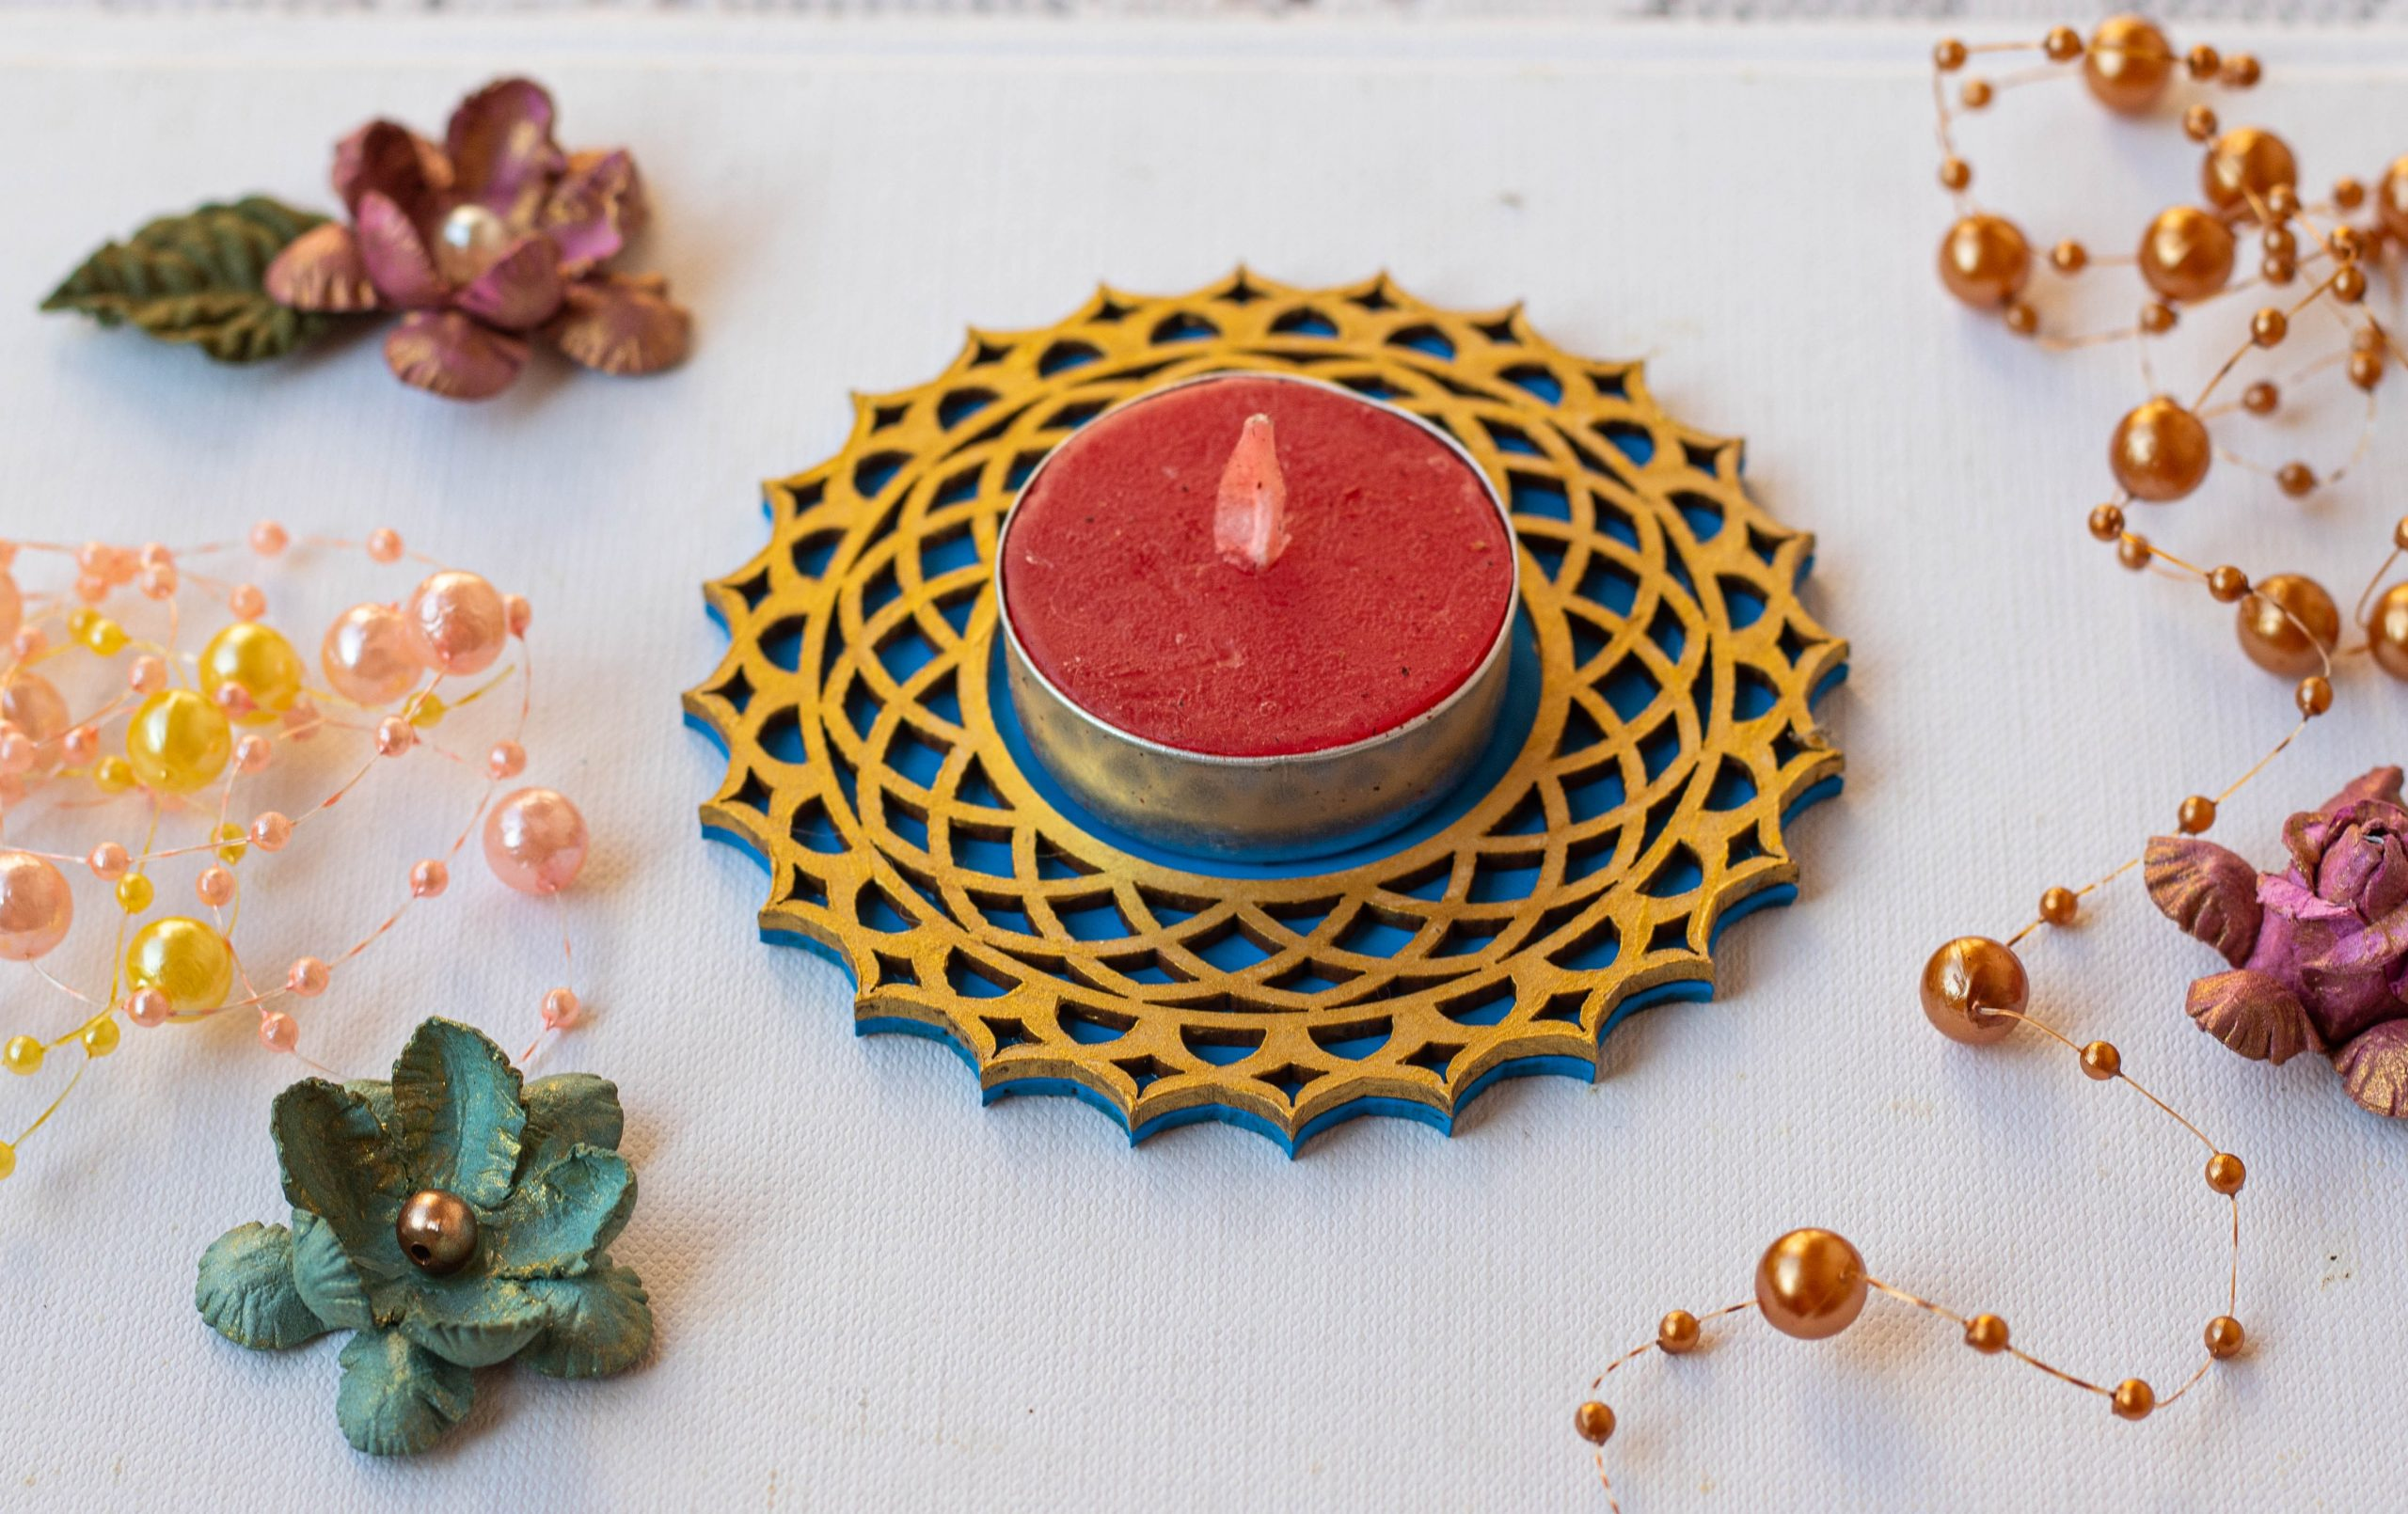 Diwali Decorative Tea Light Holders  Diwali Decorative Tea Light Holders